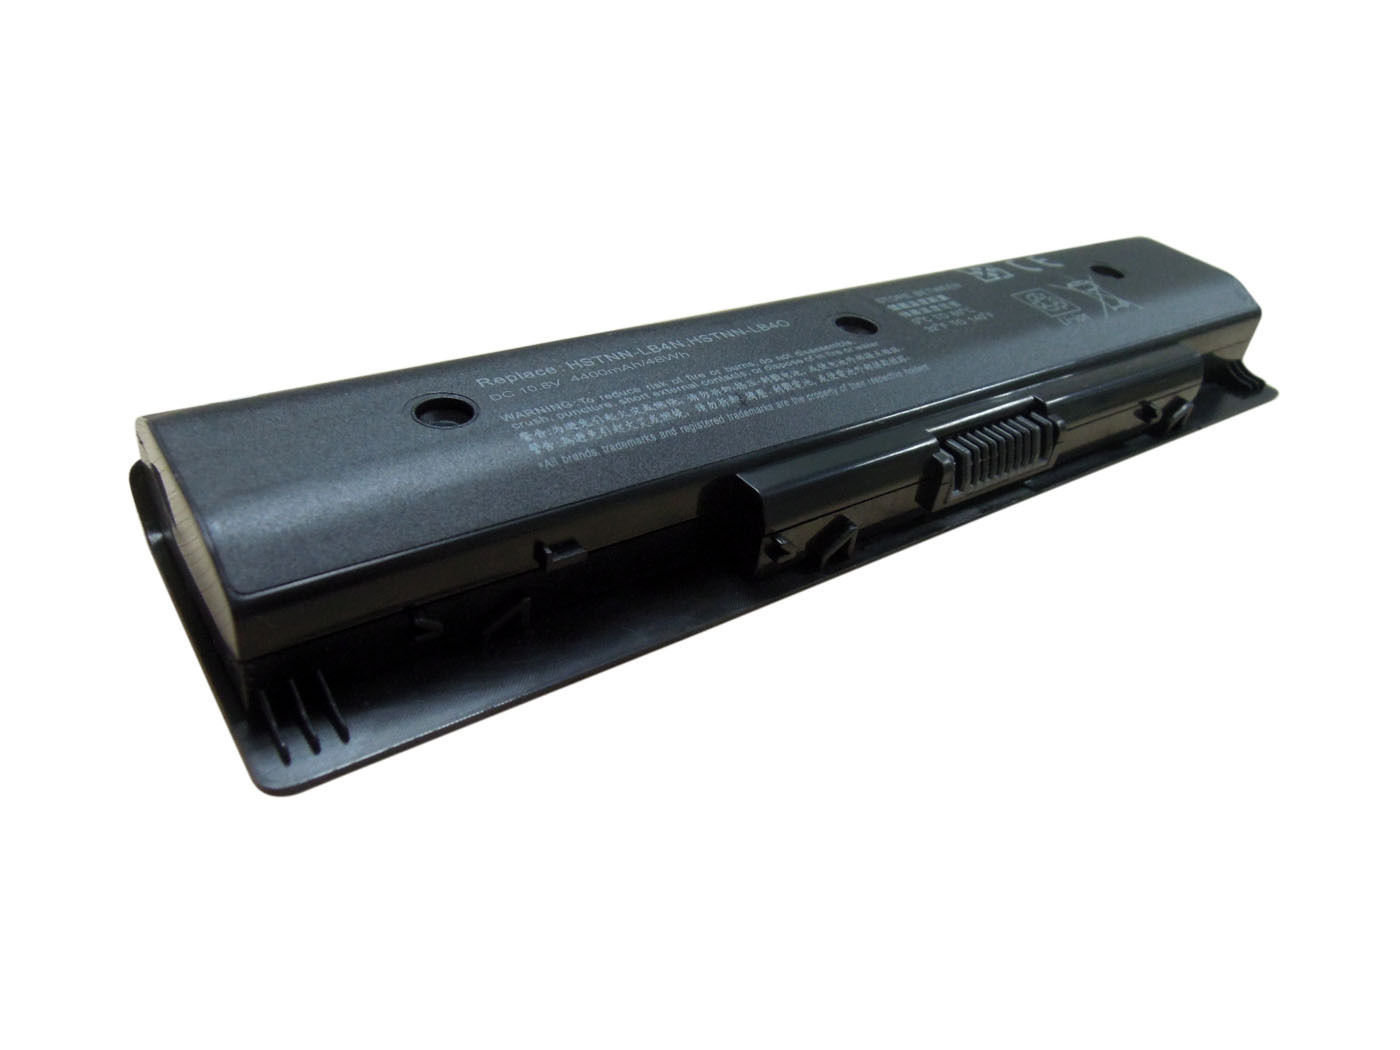 HP HSTNN-LB4N HSTNN-LB4O series compatible laptop battery